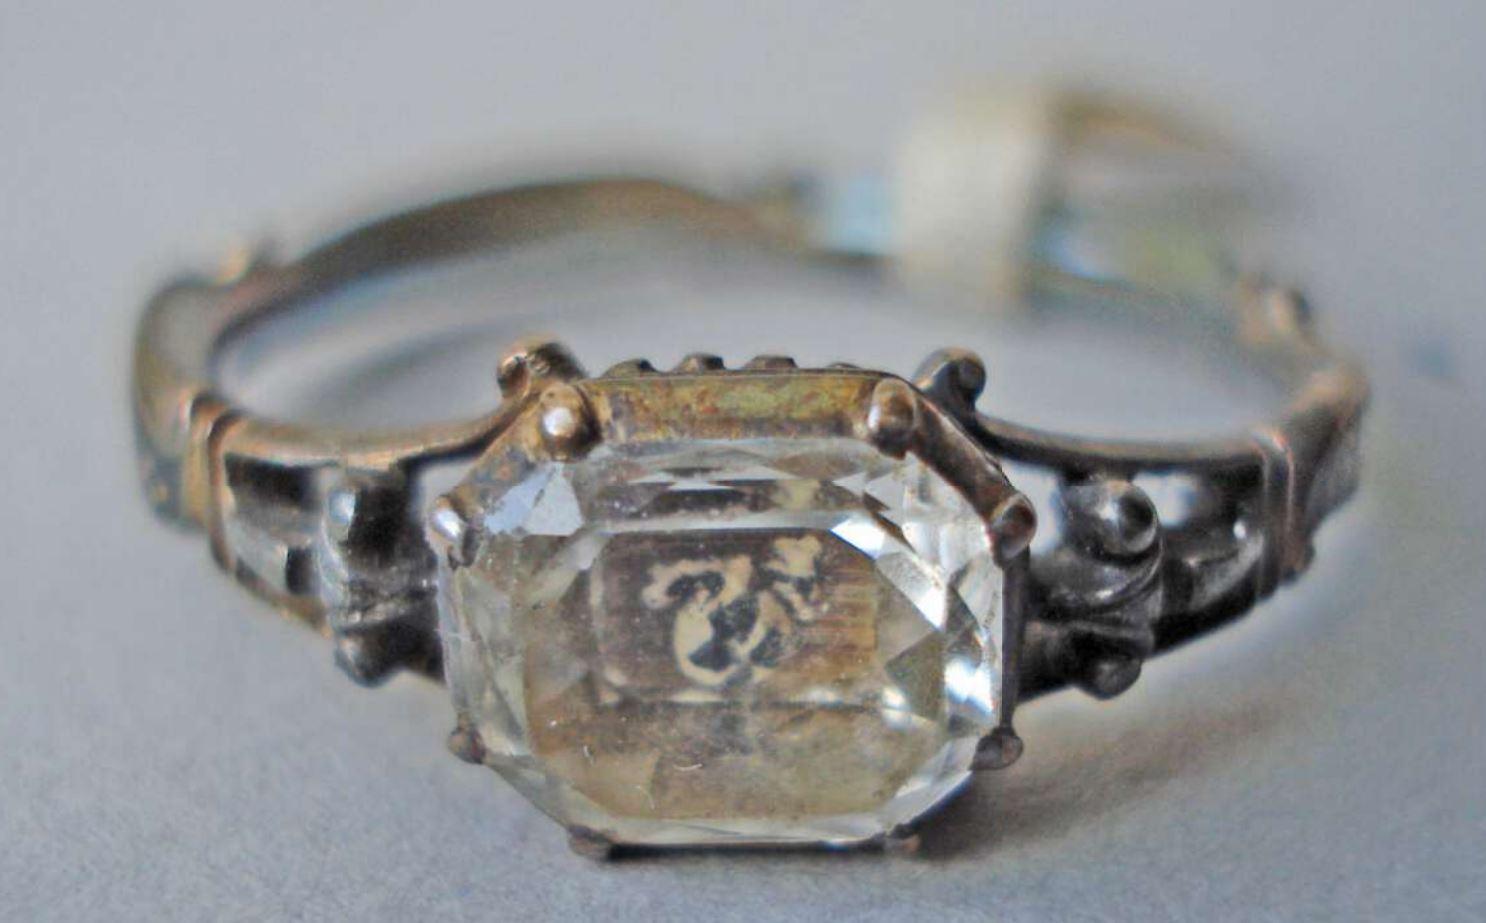 Mourning ring 1731 GEORGE BUCHANAN British Museum